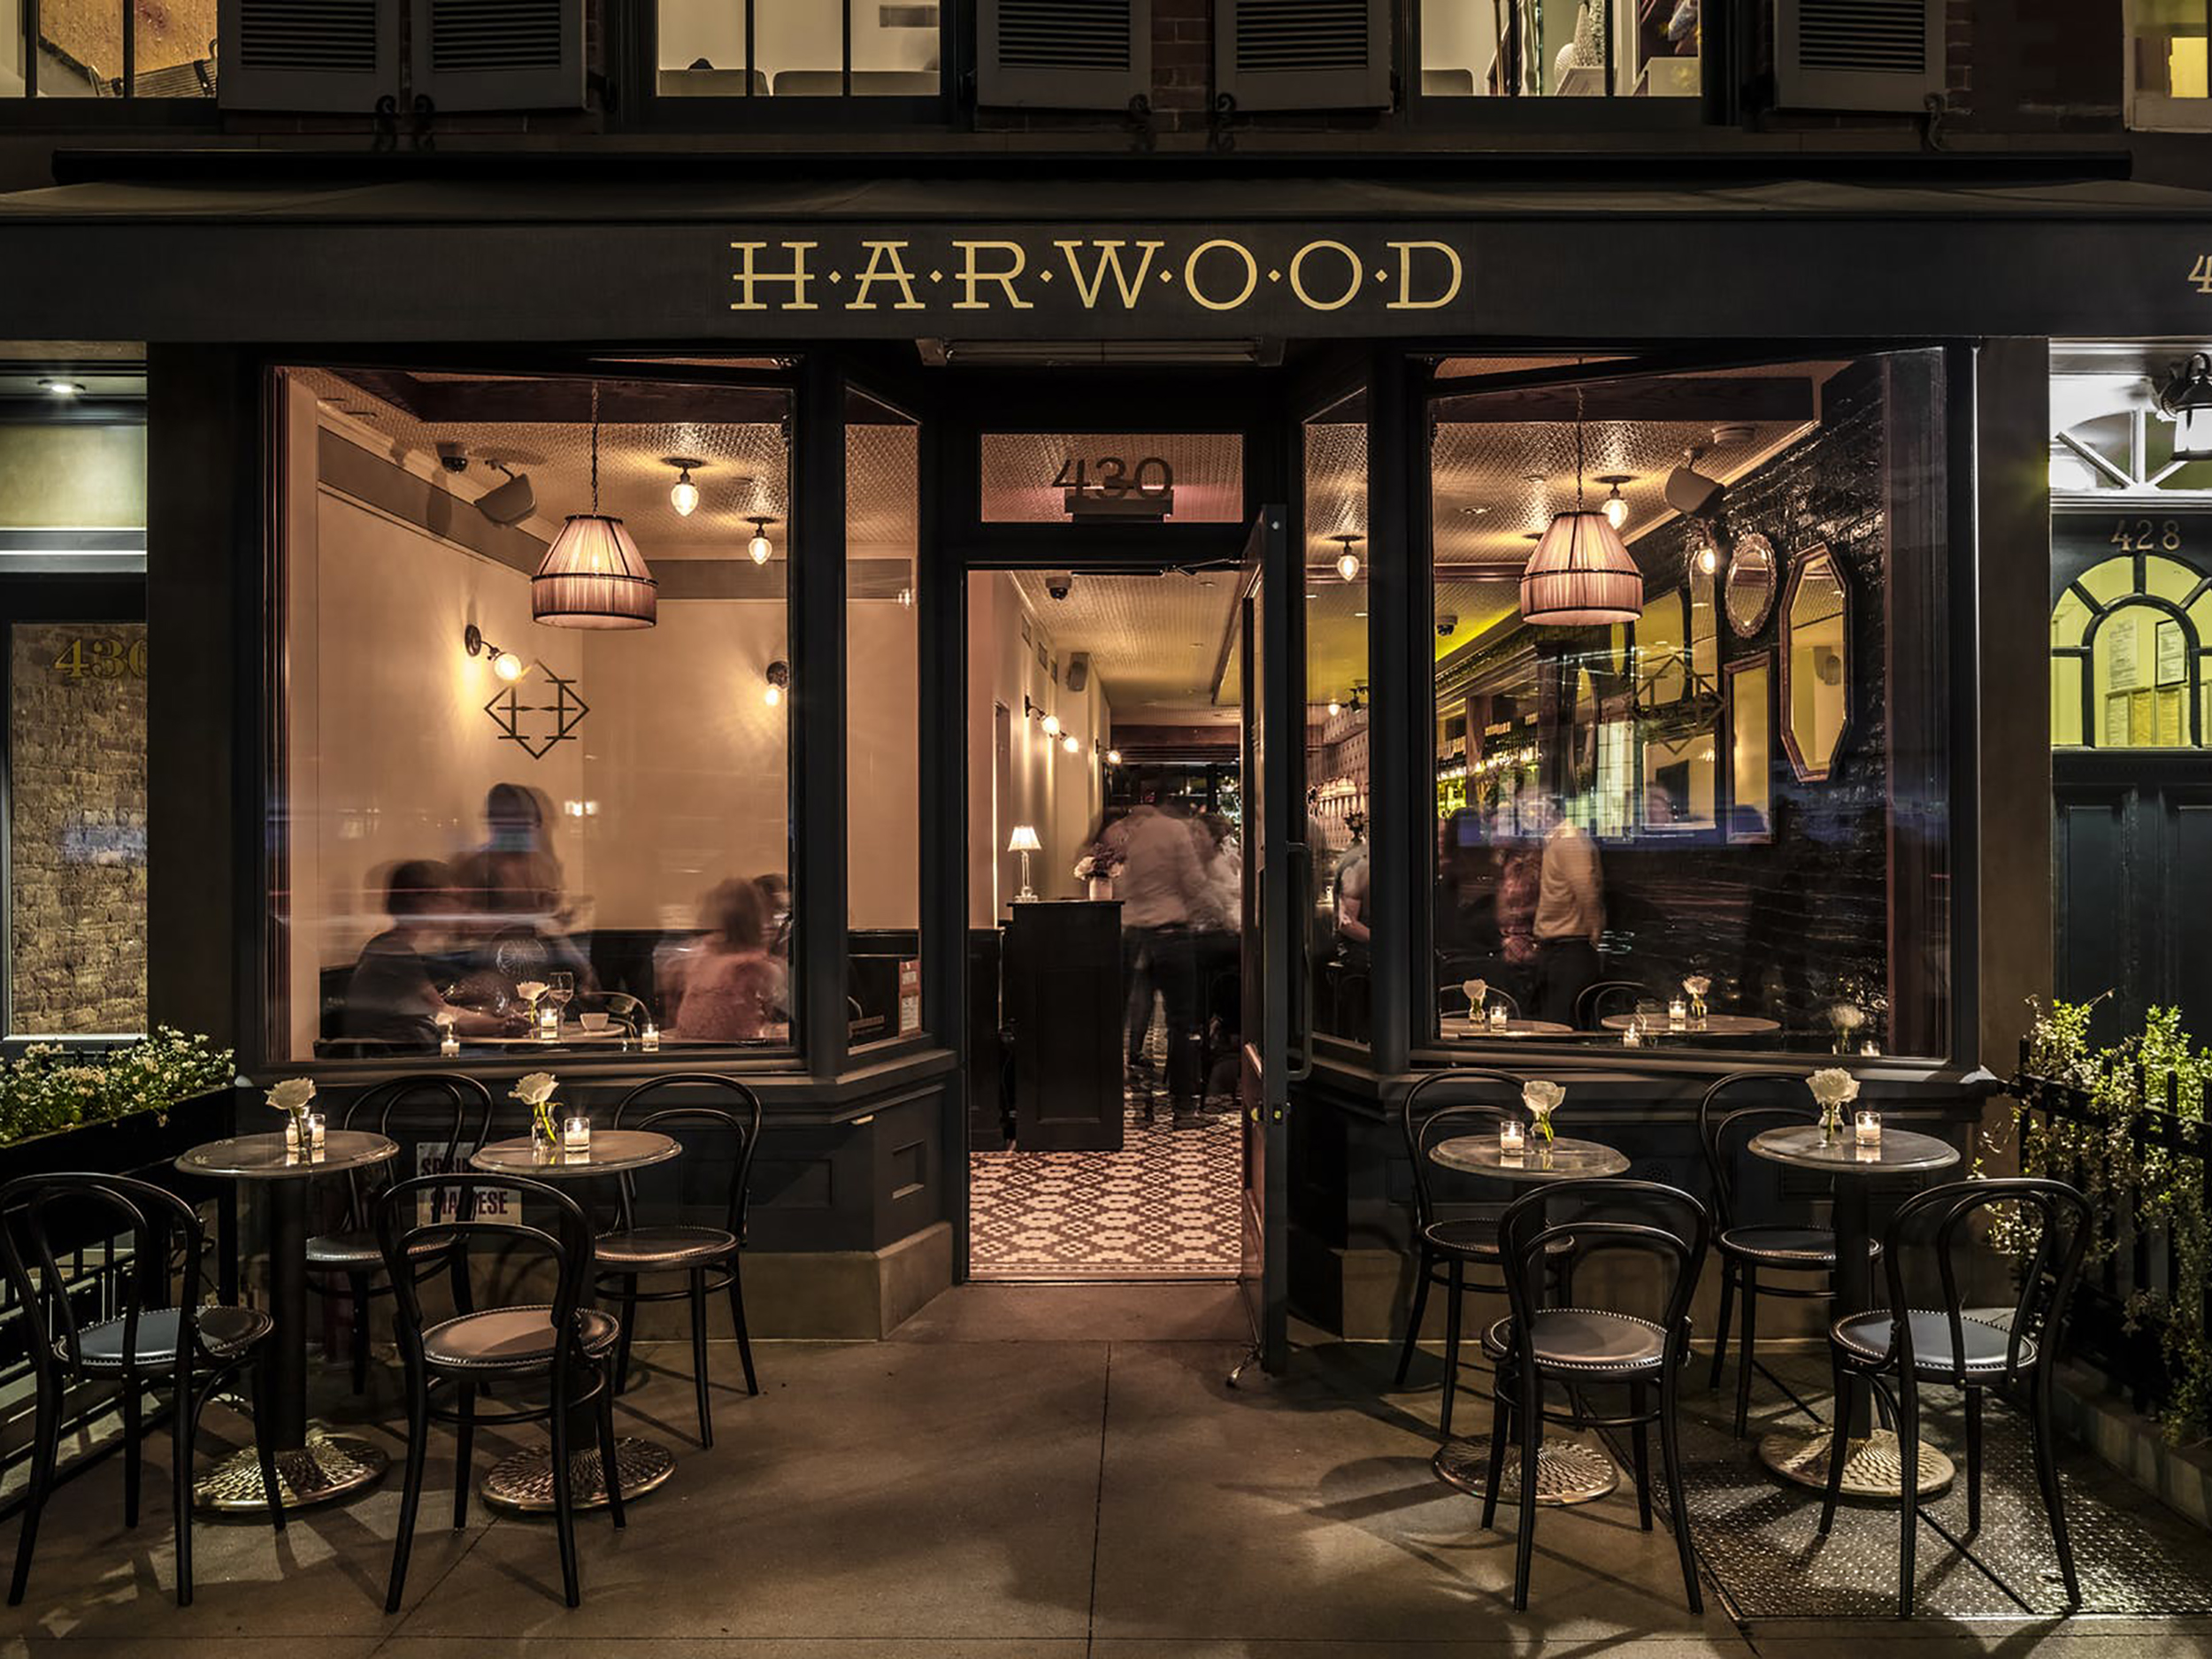 Harwood_facade_open.jpg